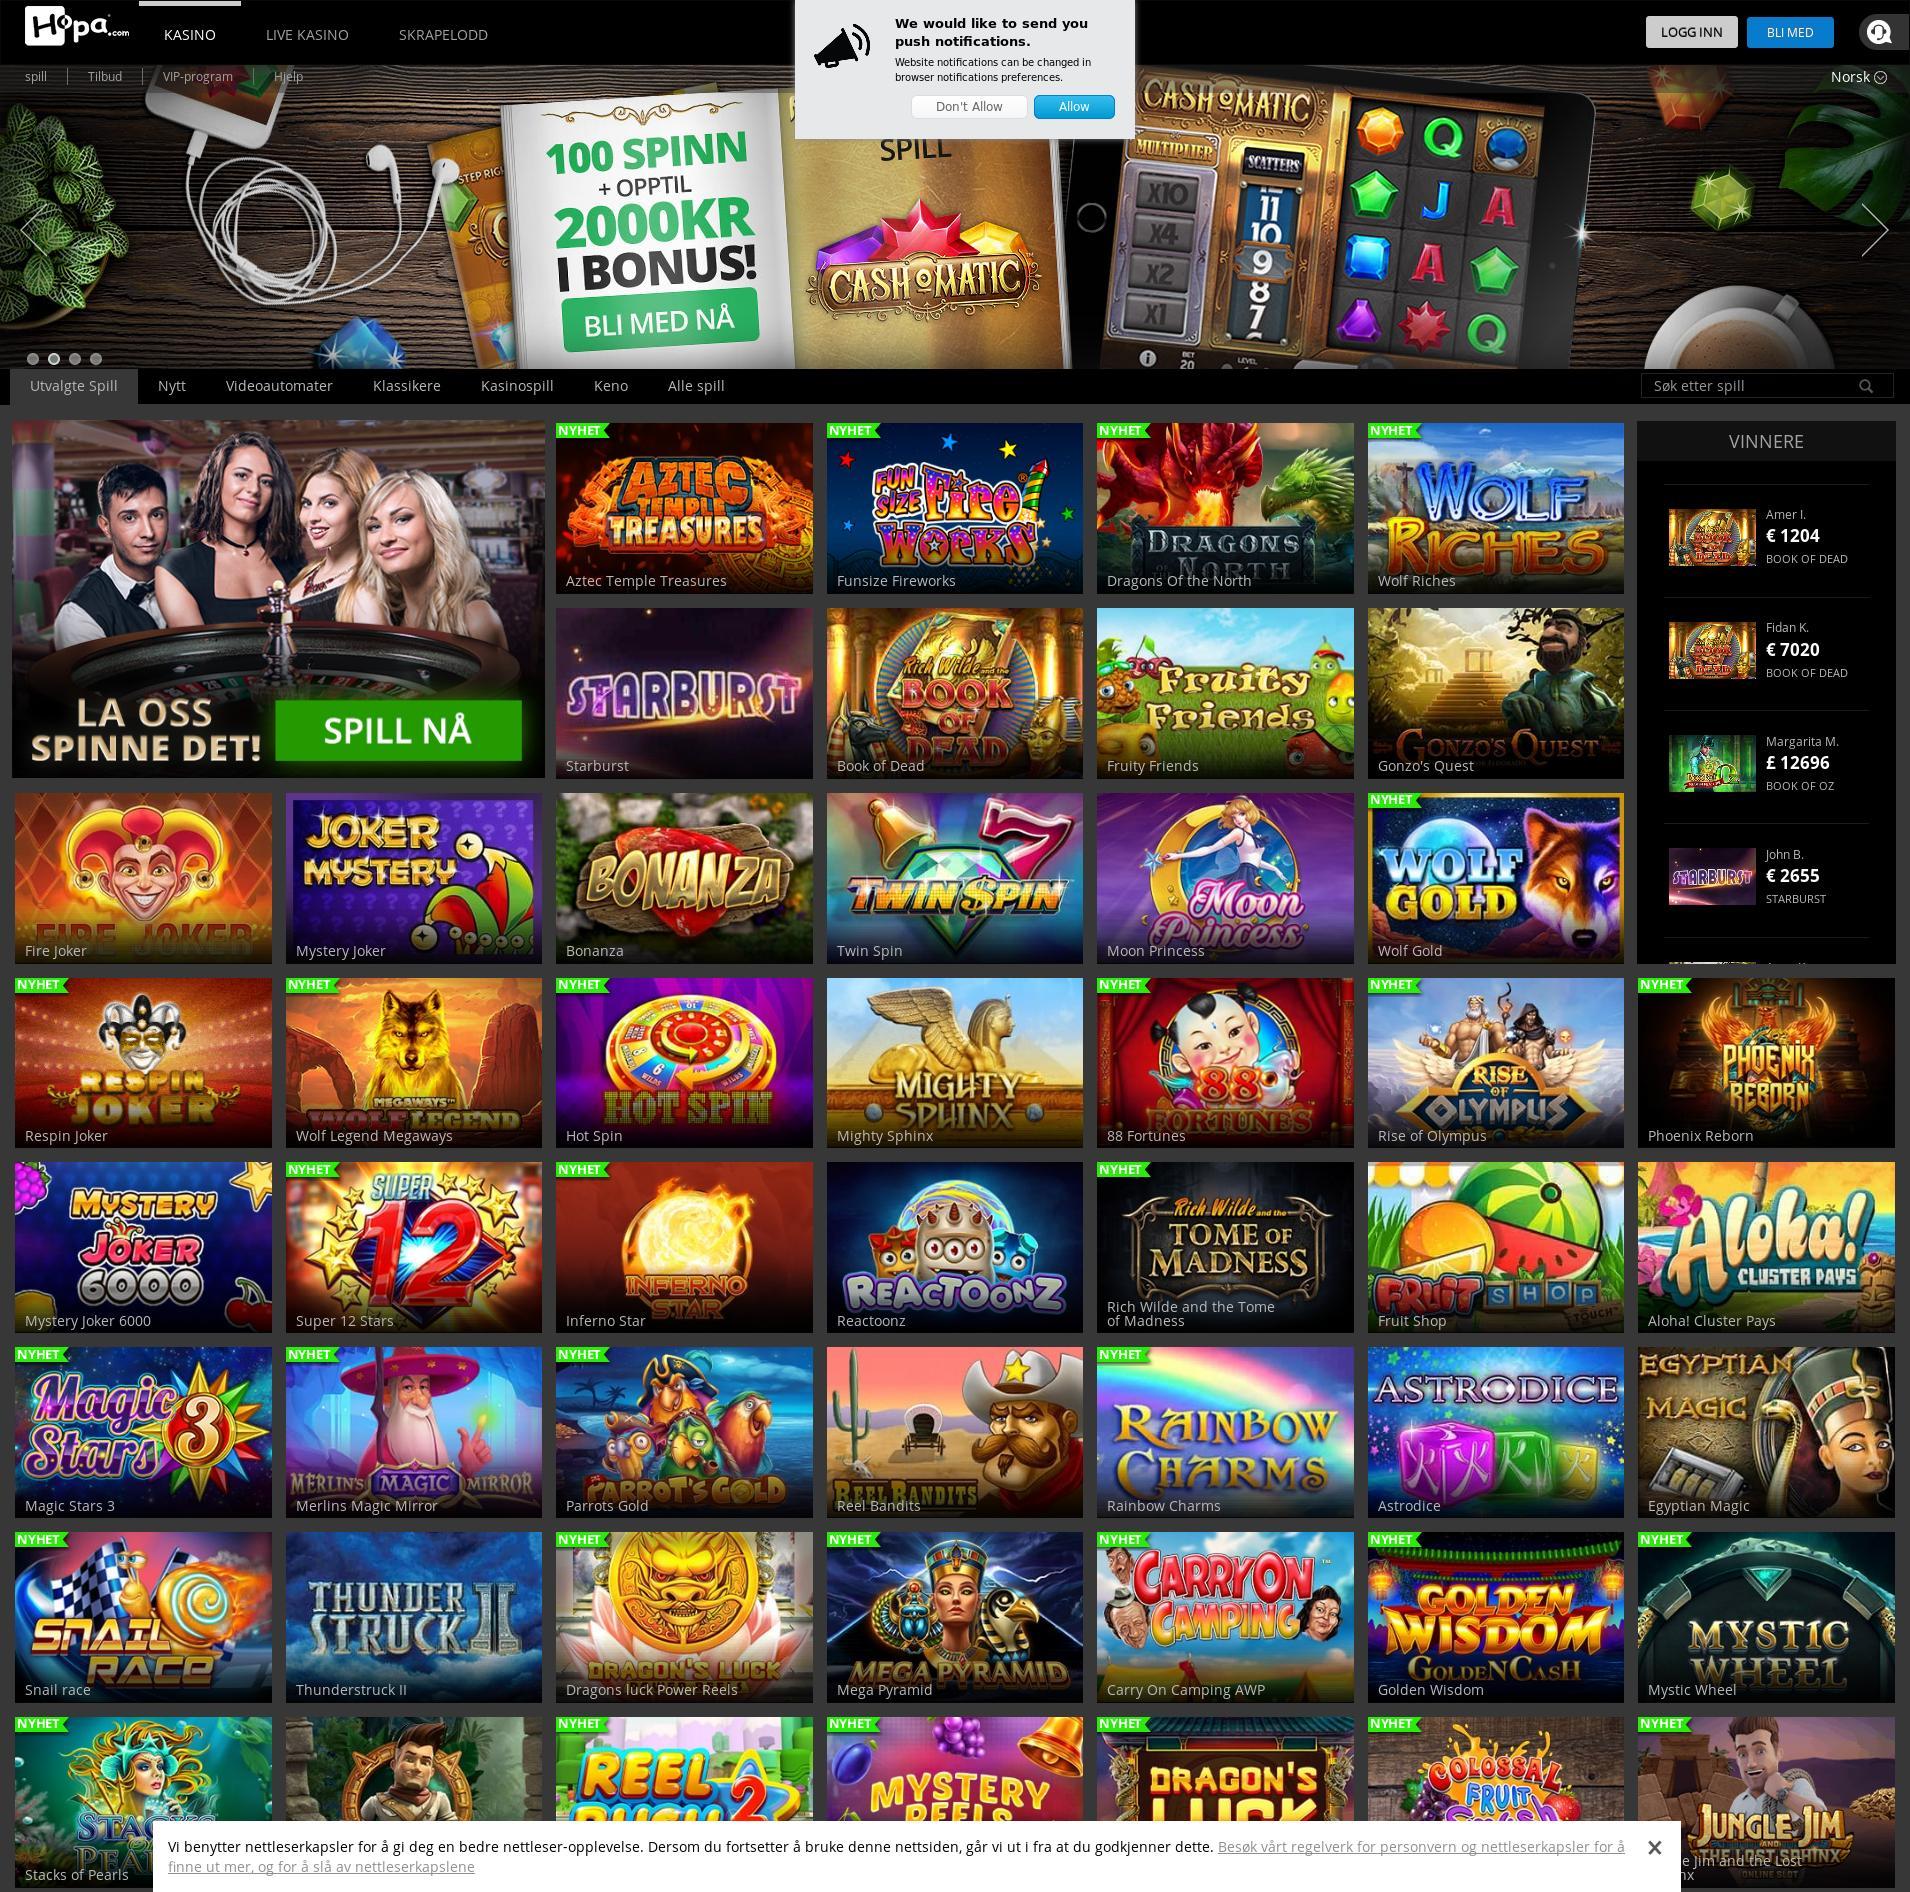 Casino screen Lobby 2019-11-19 for Norway